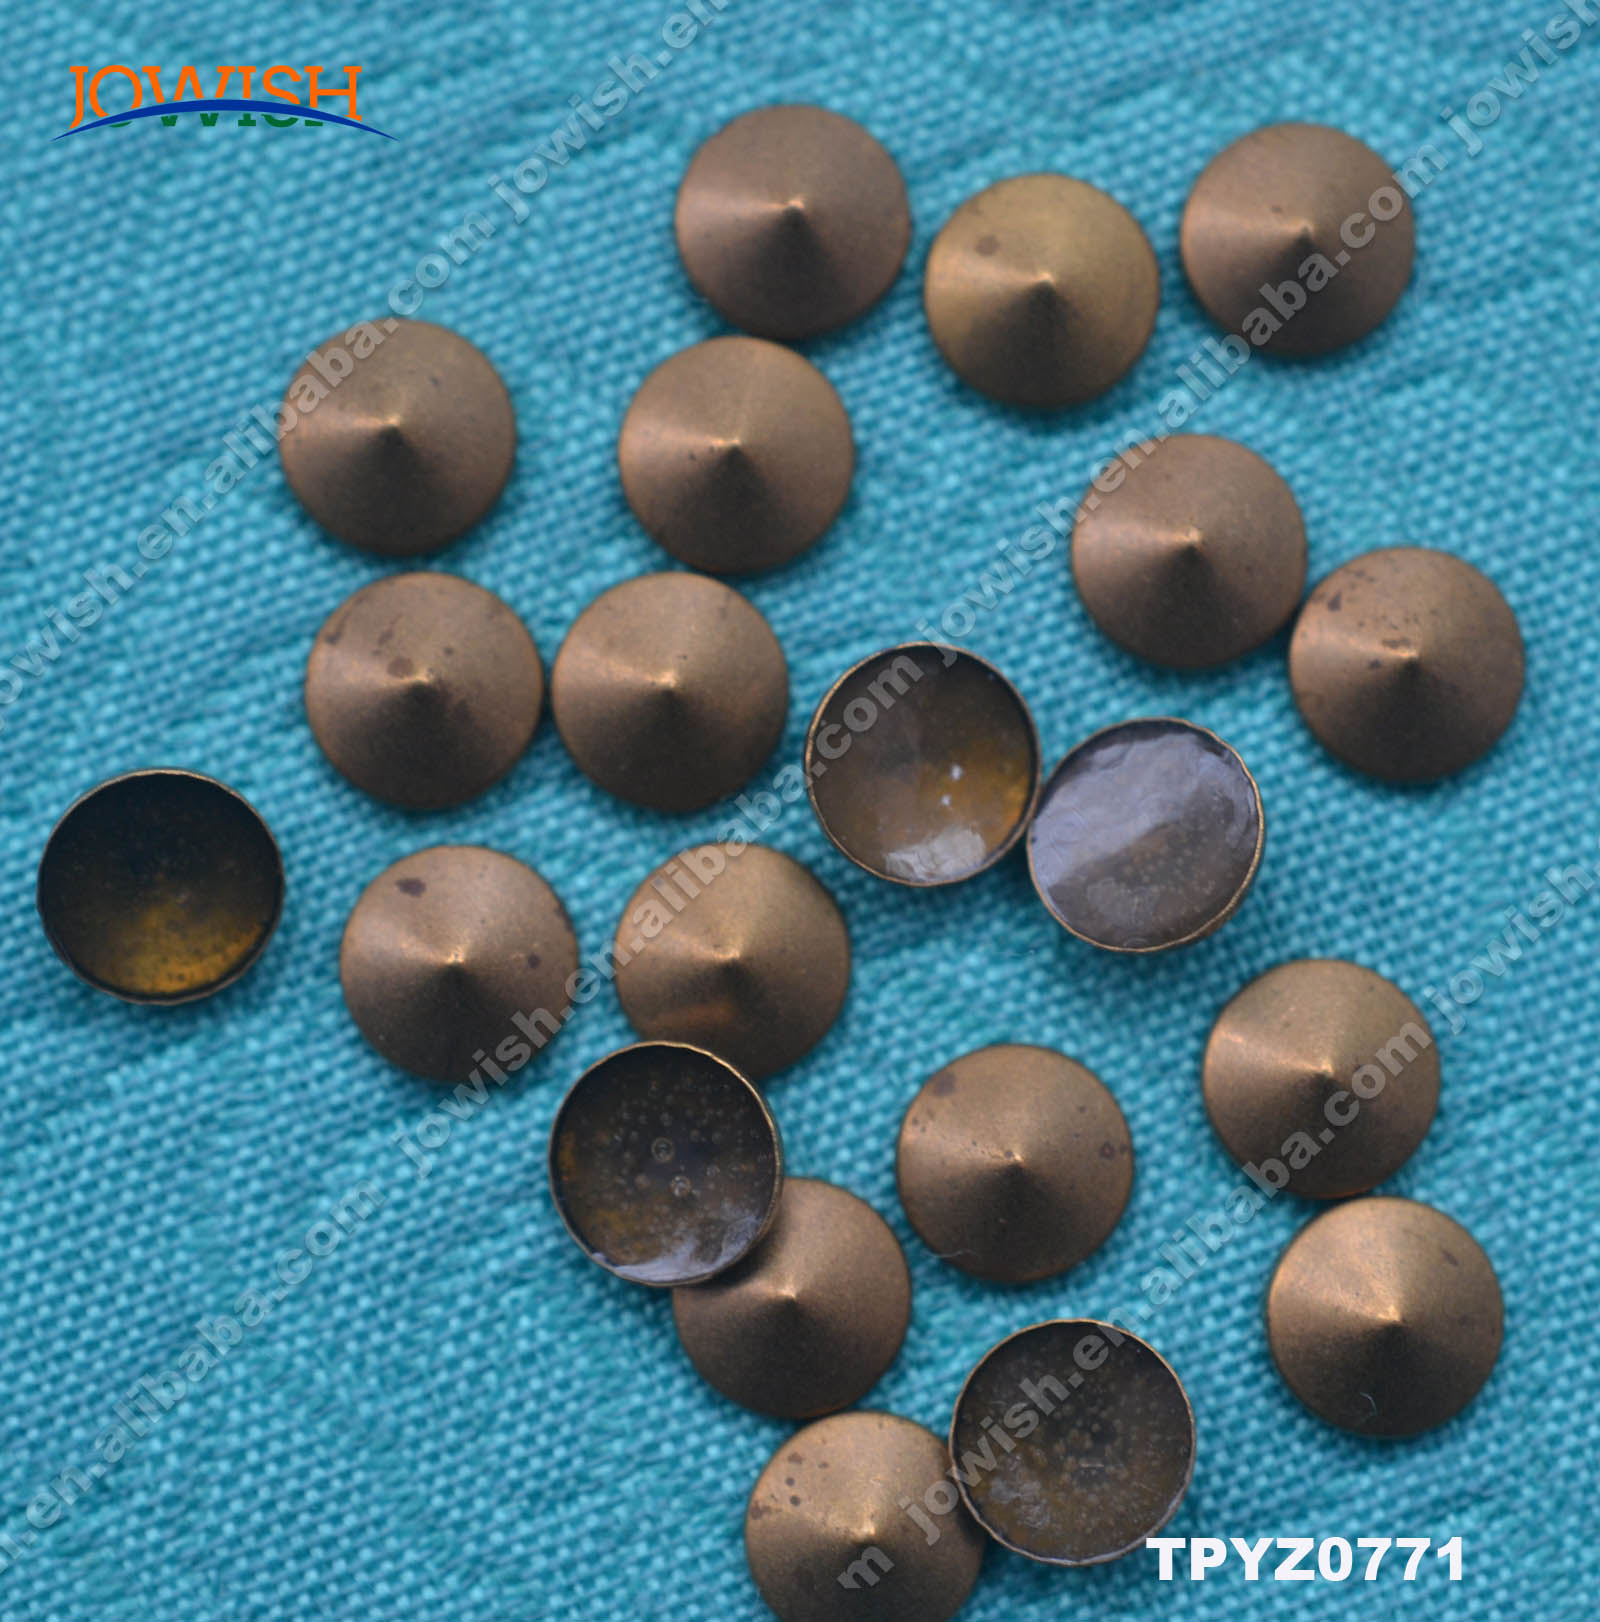 144PCS Metal Rhinestud Ornament Round Iron On Hotfix Studs Motif Gray Gun